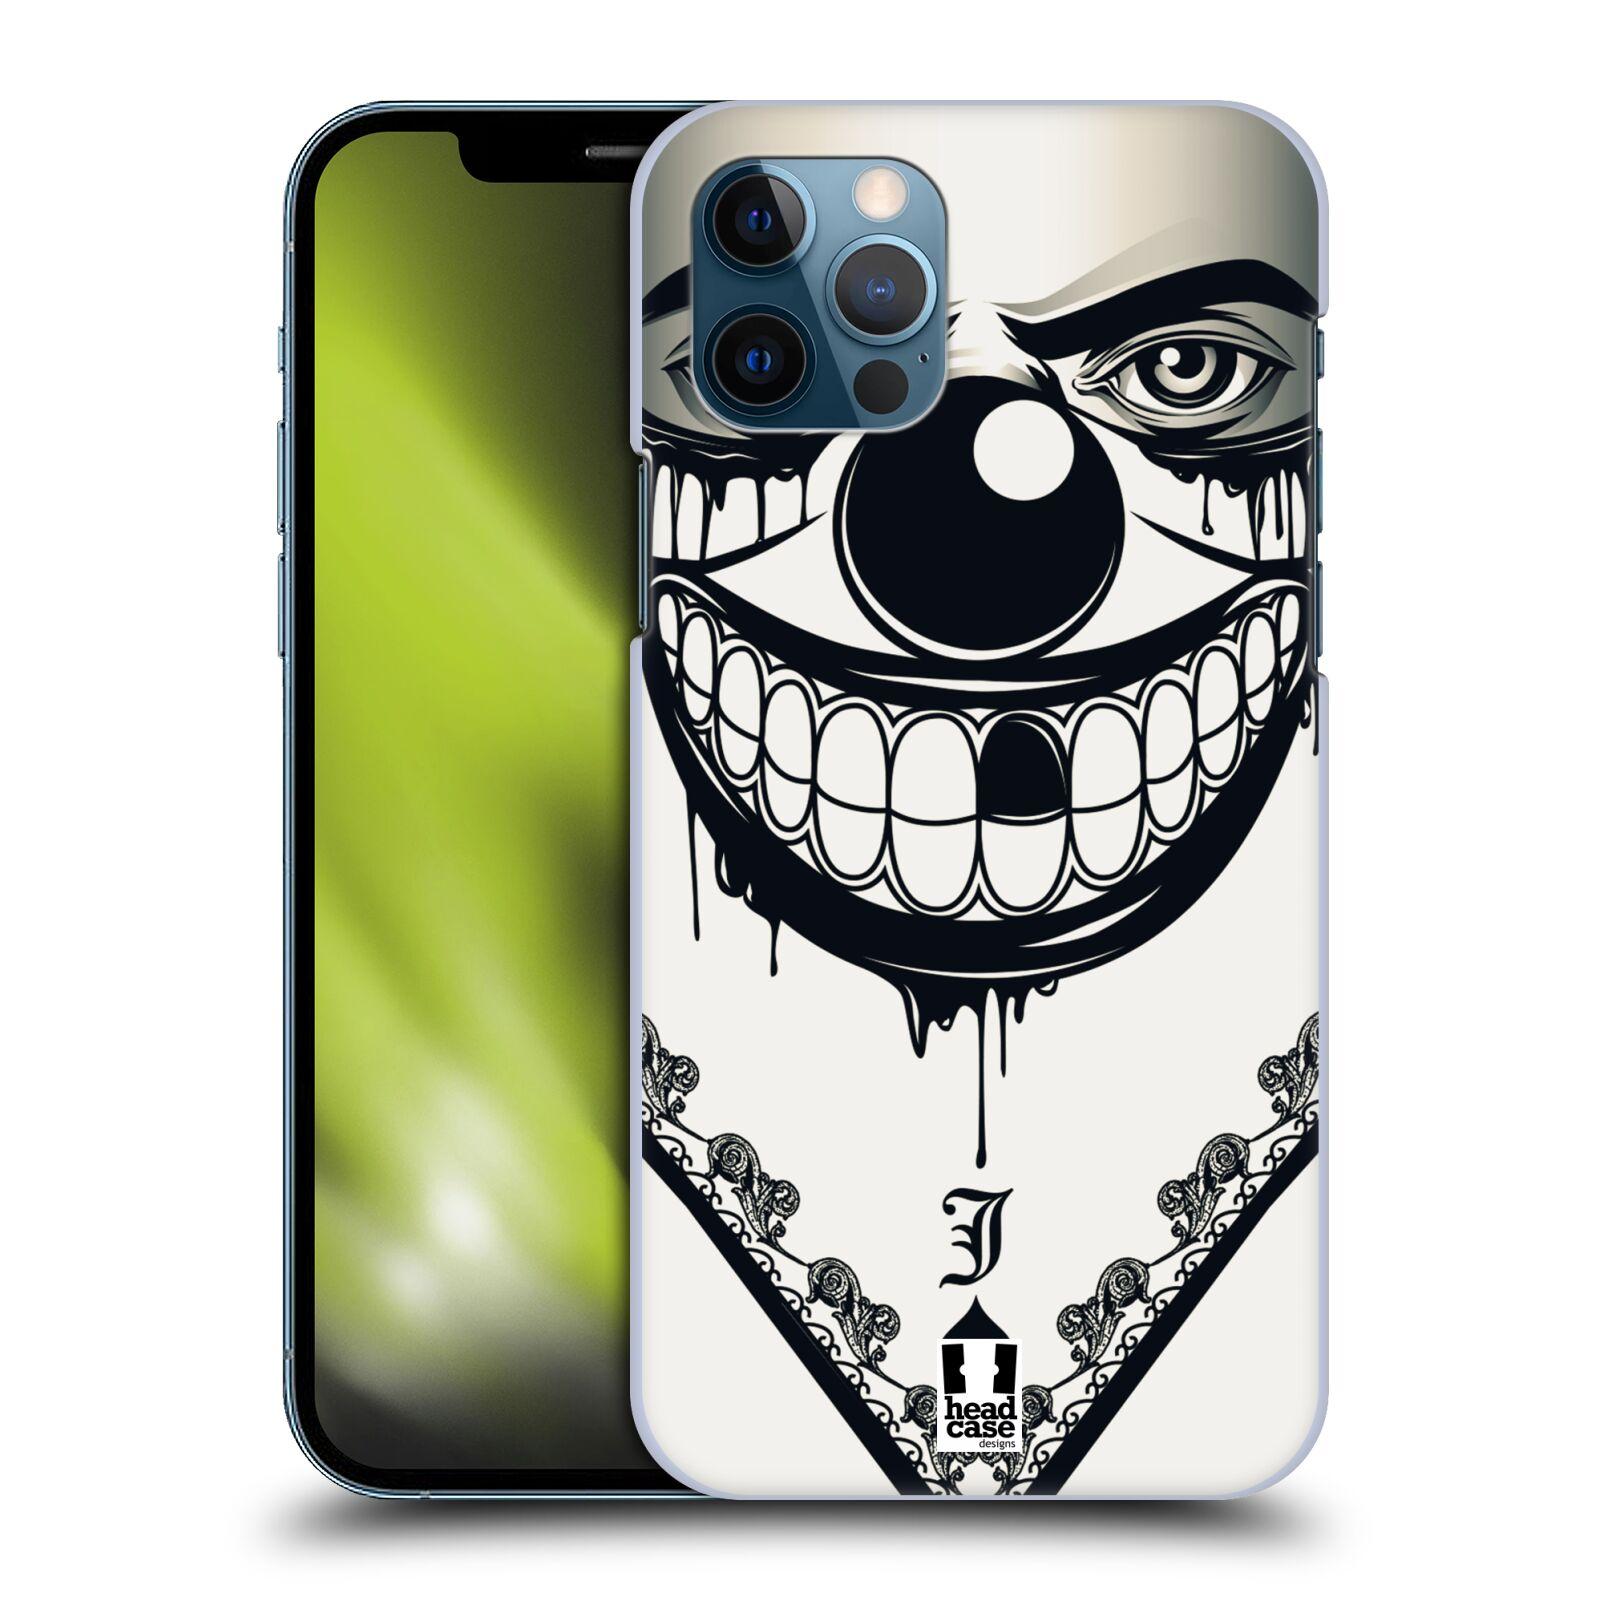 Plastové pouzdro na mobil Apple iPhone 12 / 12 Pro - Head Case - ZLEJ KLAUN